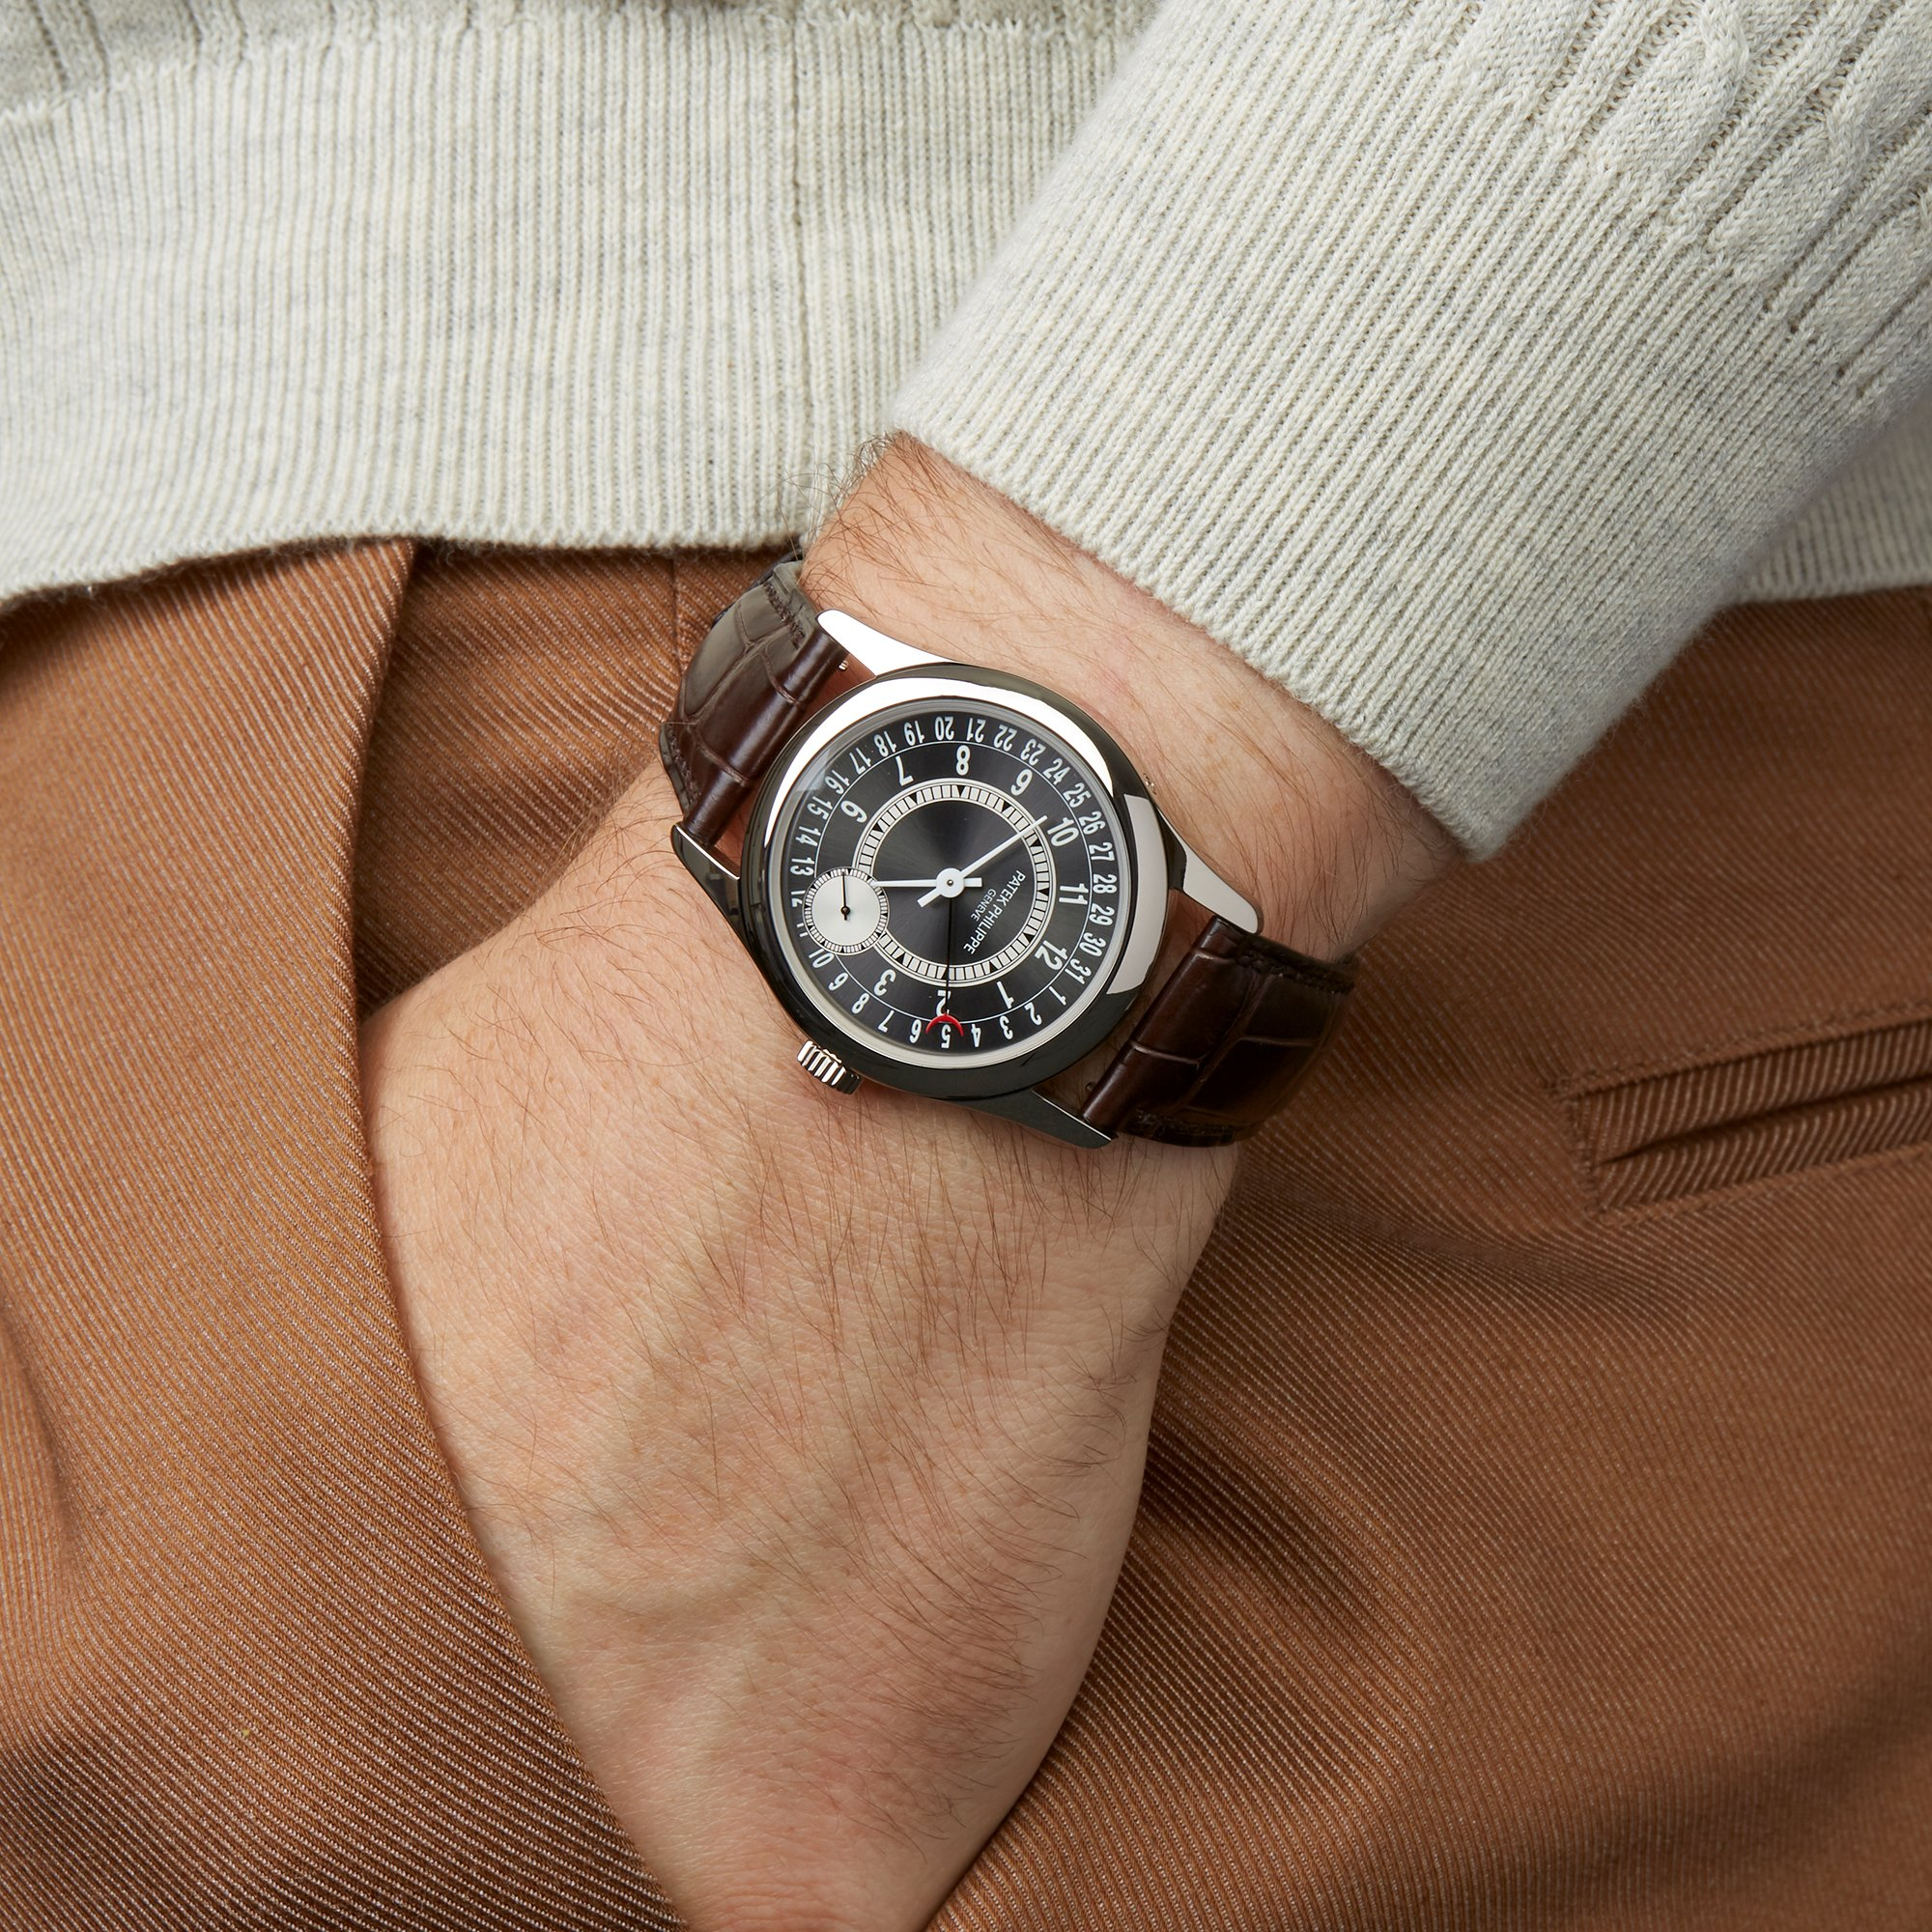 Patek Philippe Calatrava 6000G 2011 W6552 | Second Hand Watches